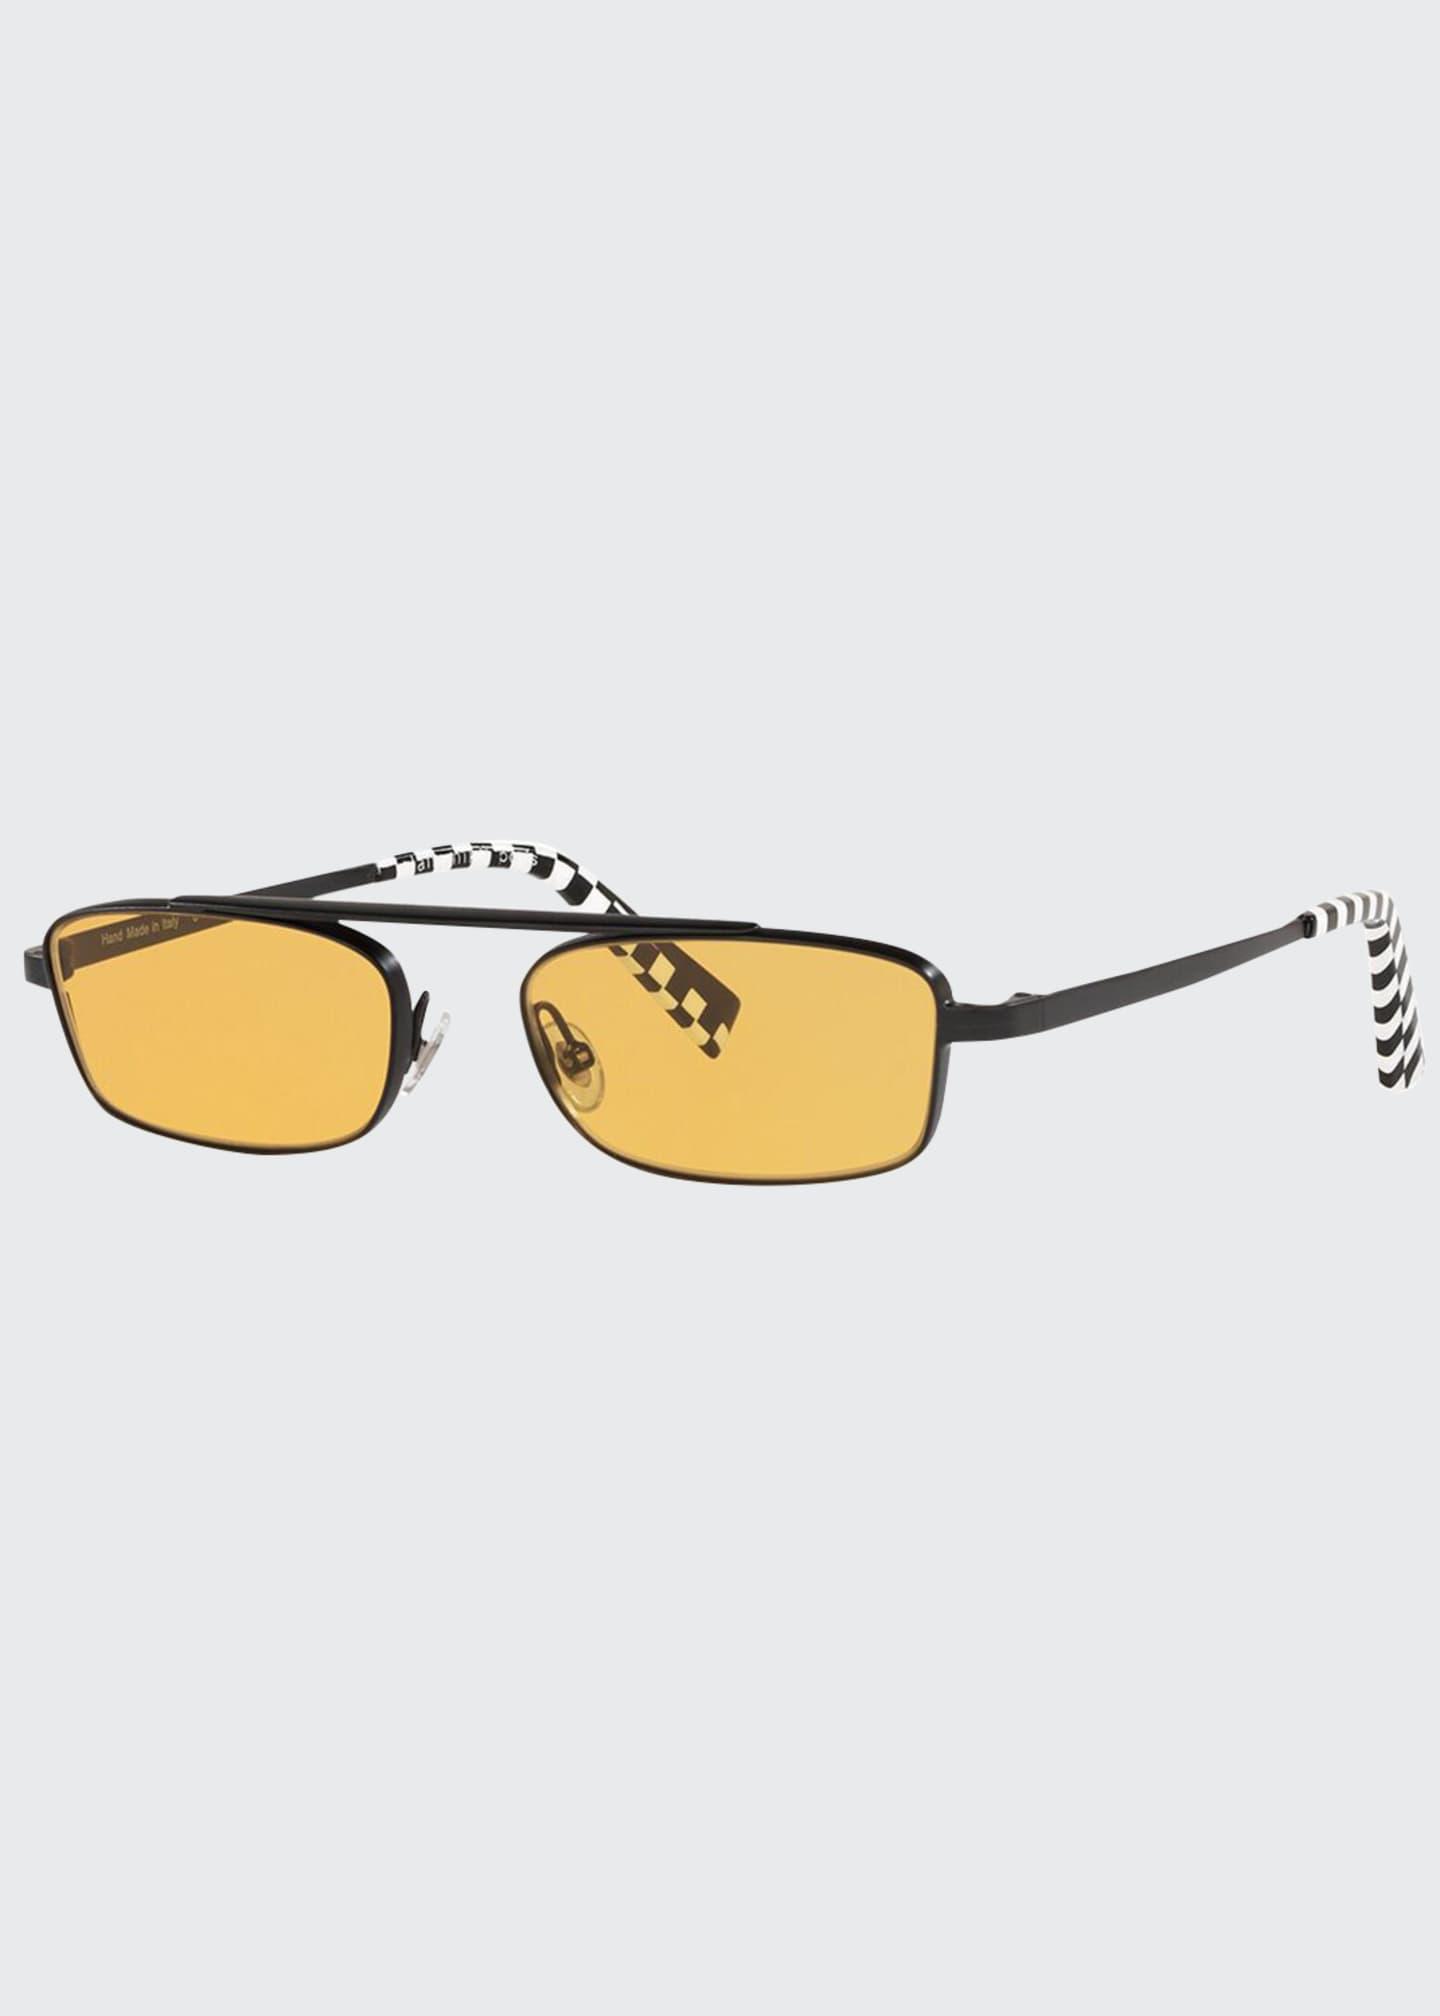 Alain Mikli Callot Rectangle Metal Sunglasses